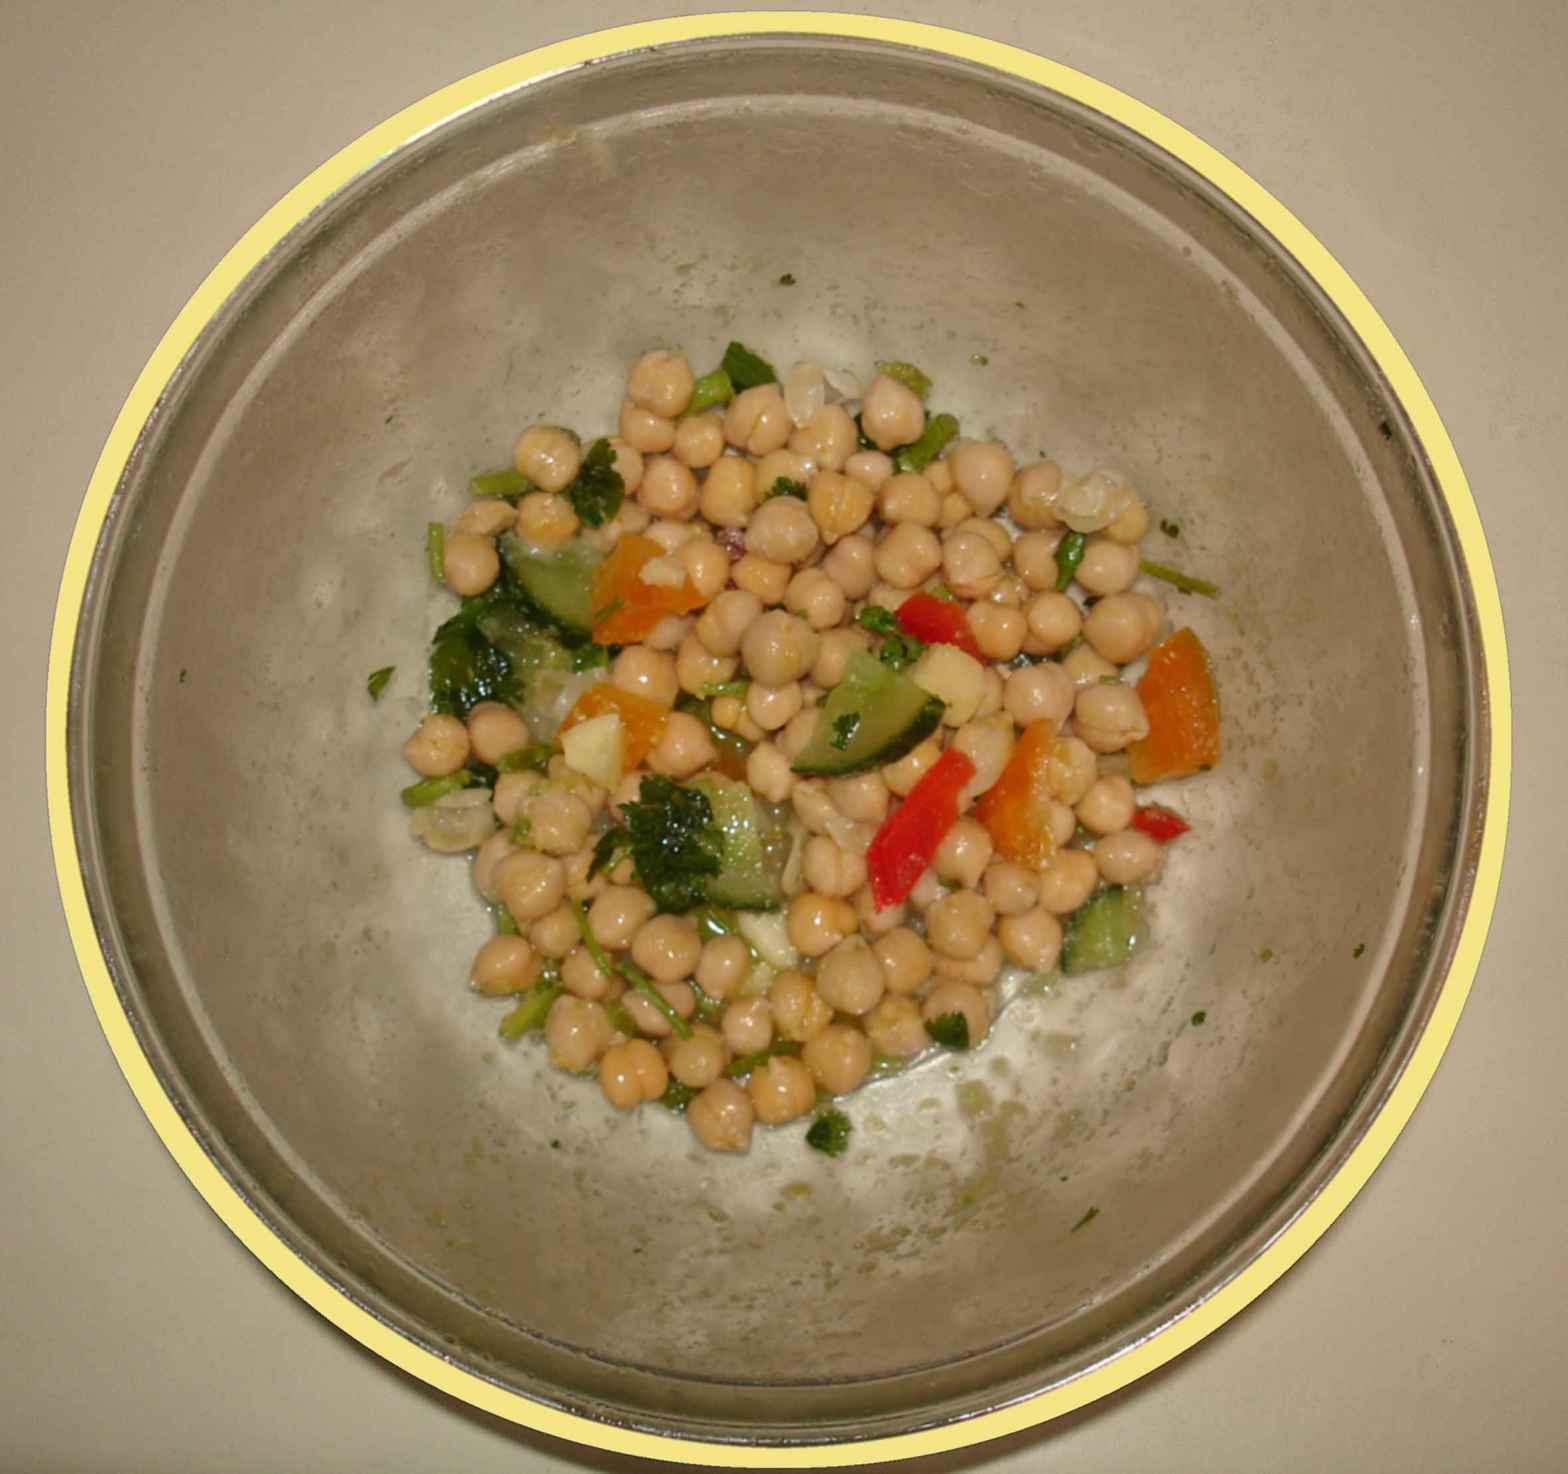 Chick pea salad called Chick Pea Delight